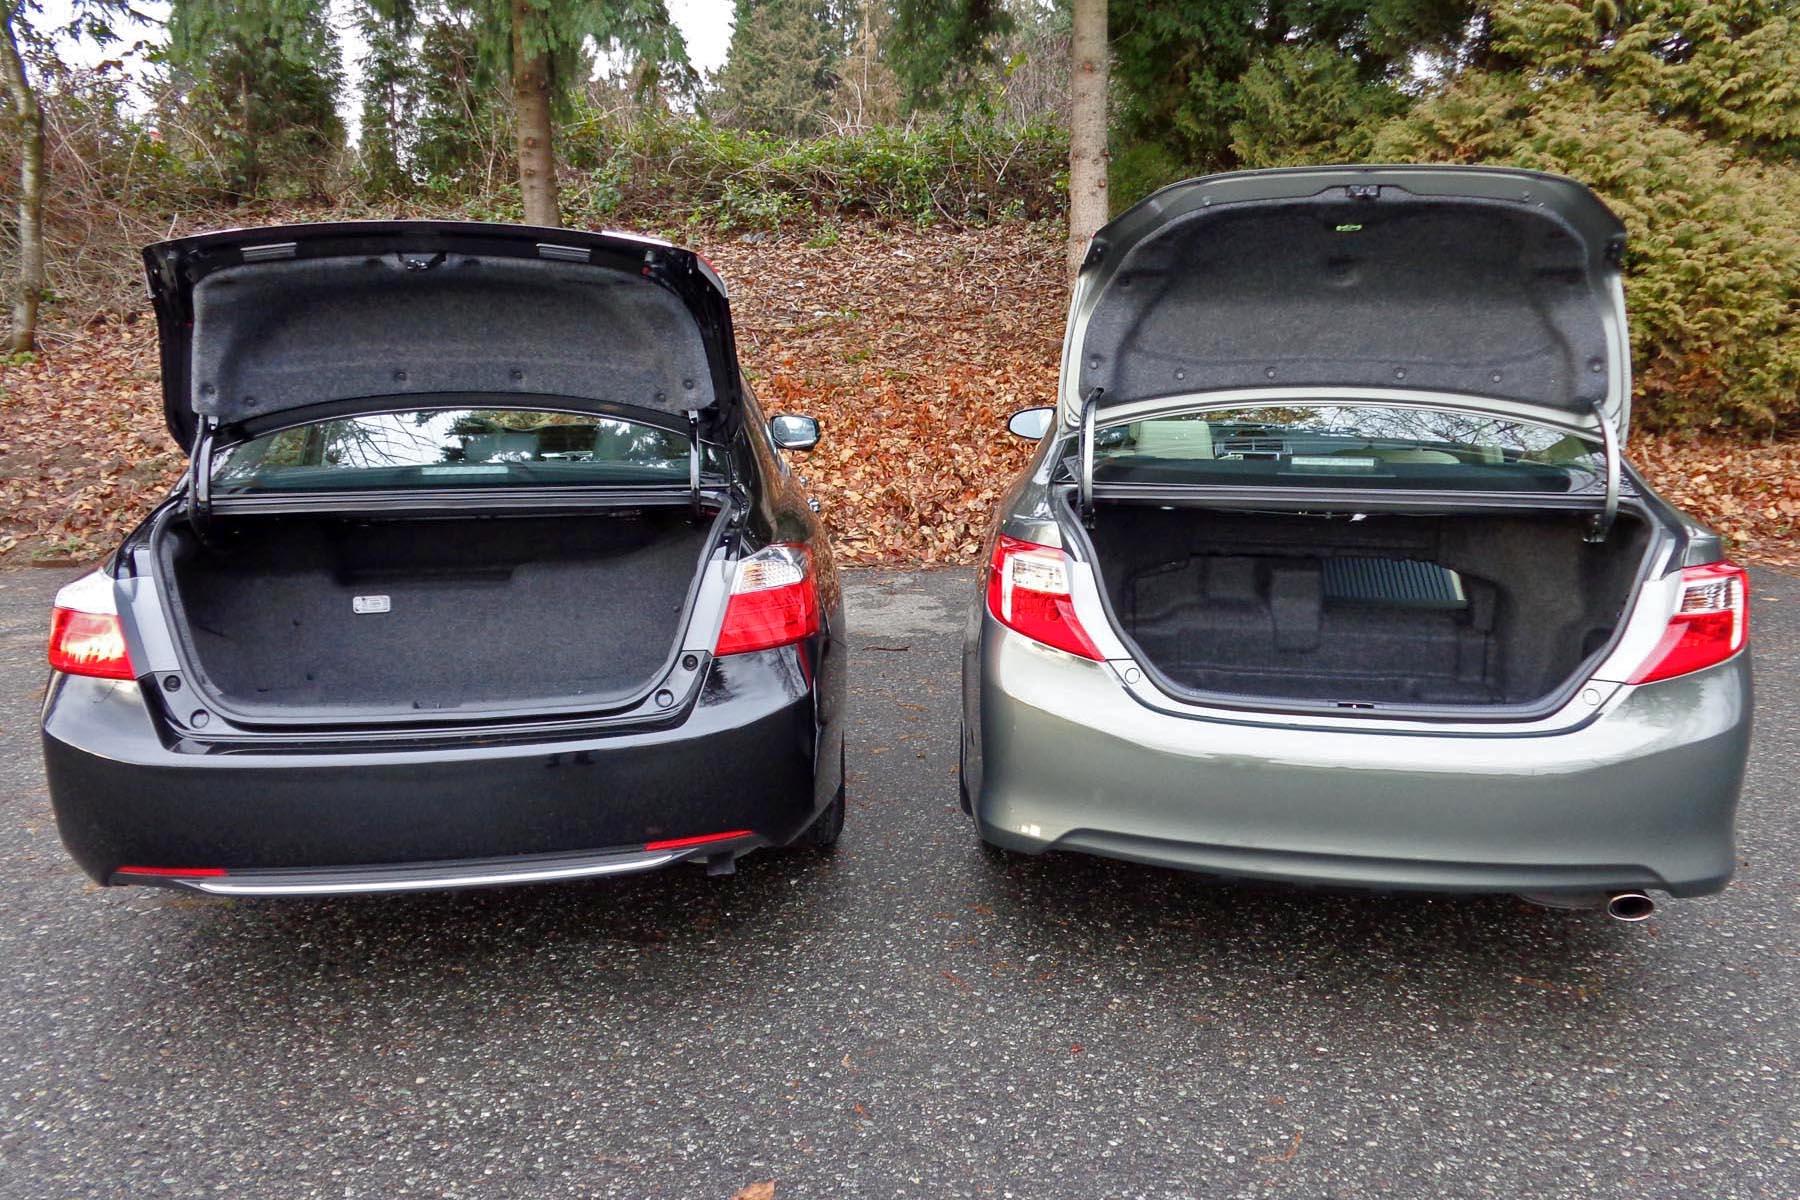 2014 Honda Accord Hybrid vs 2014 Toyota Camry Hybrid Autos